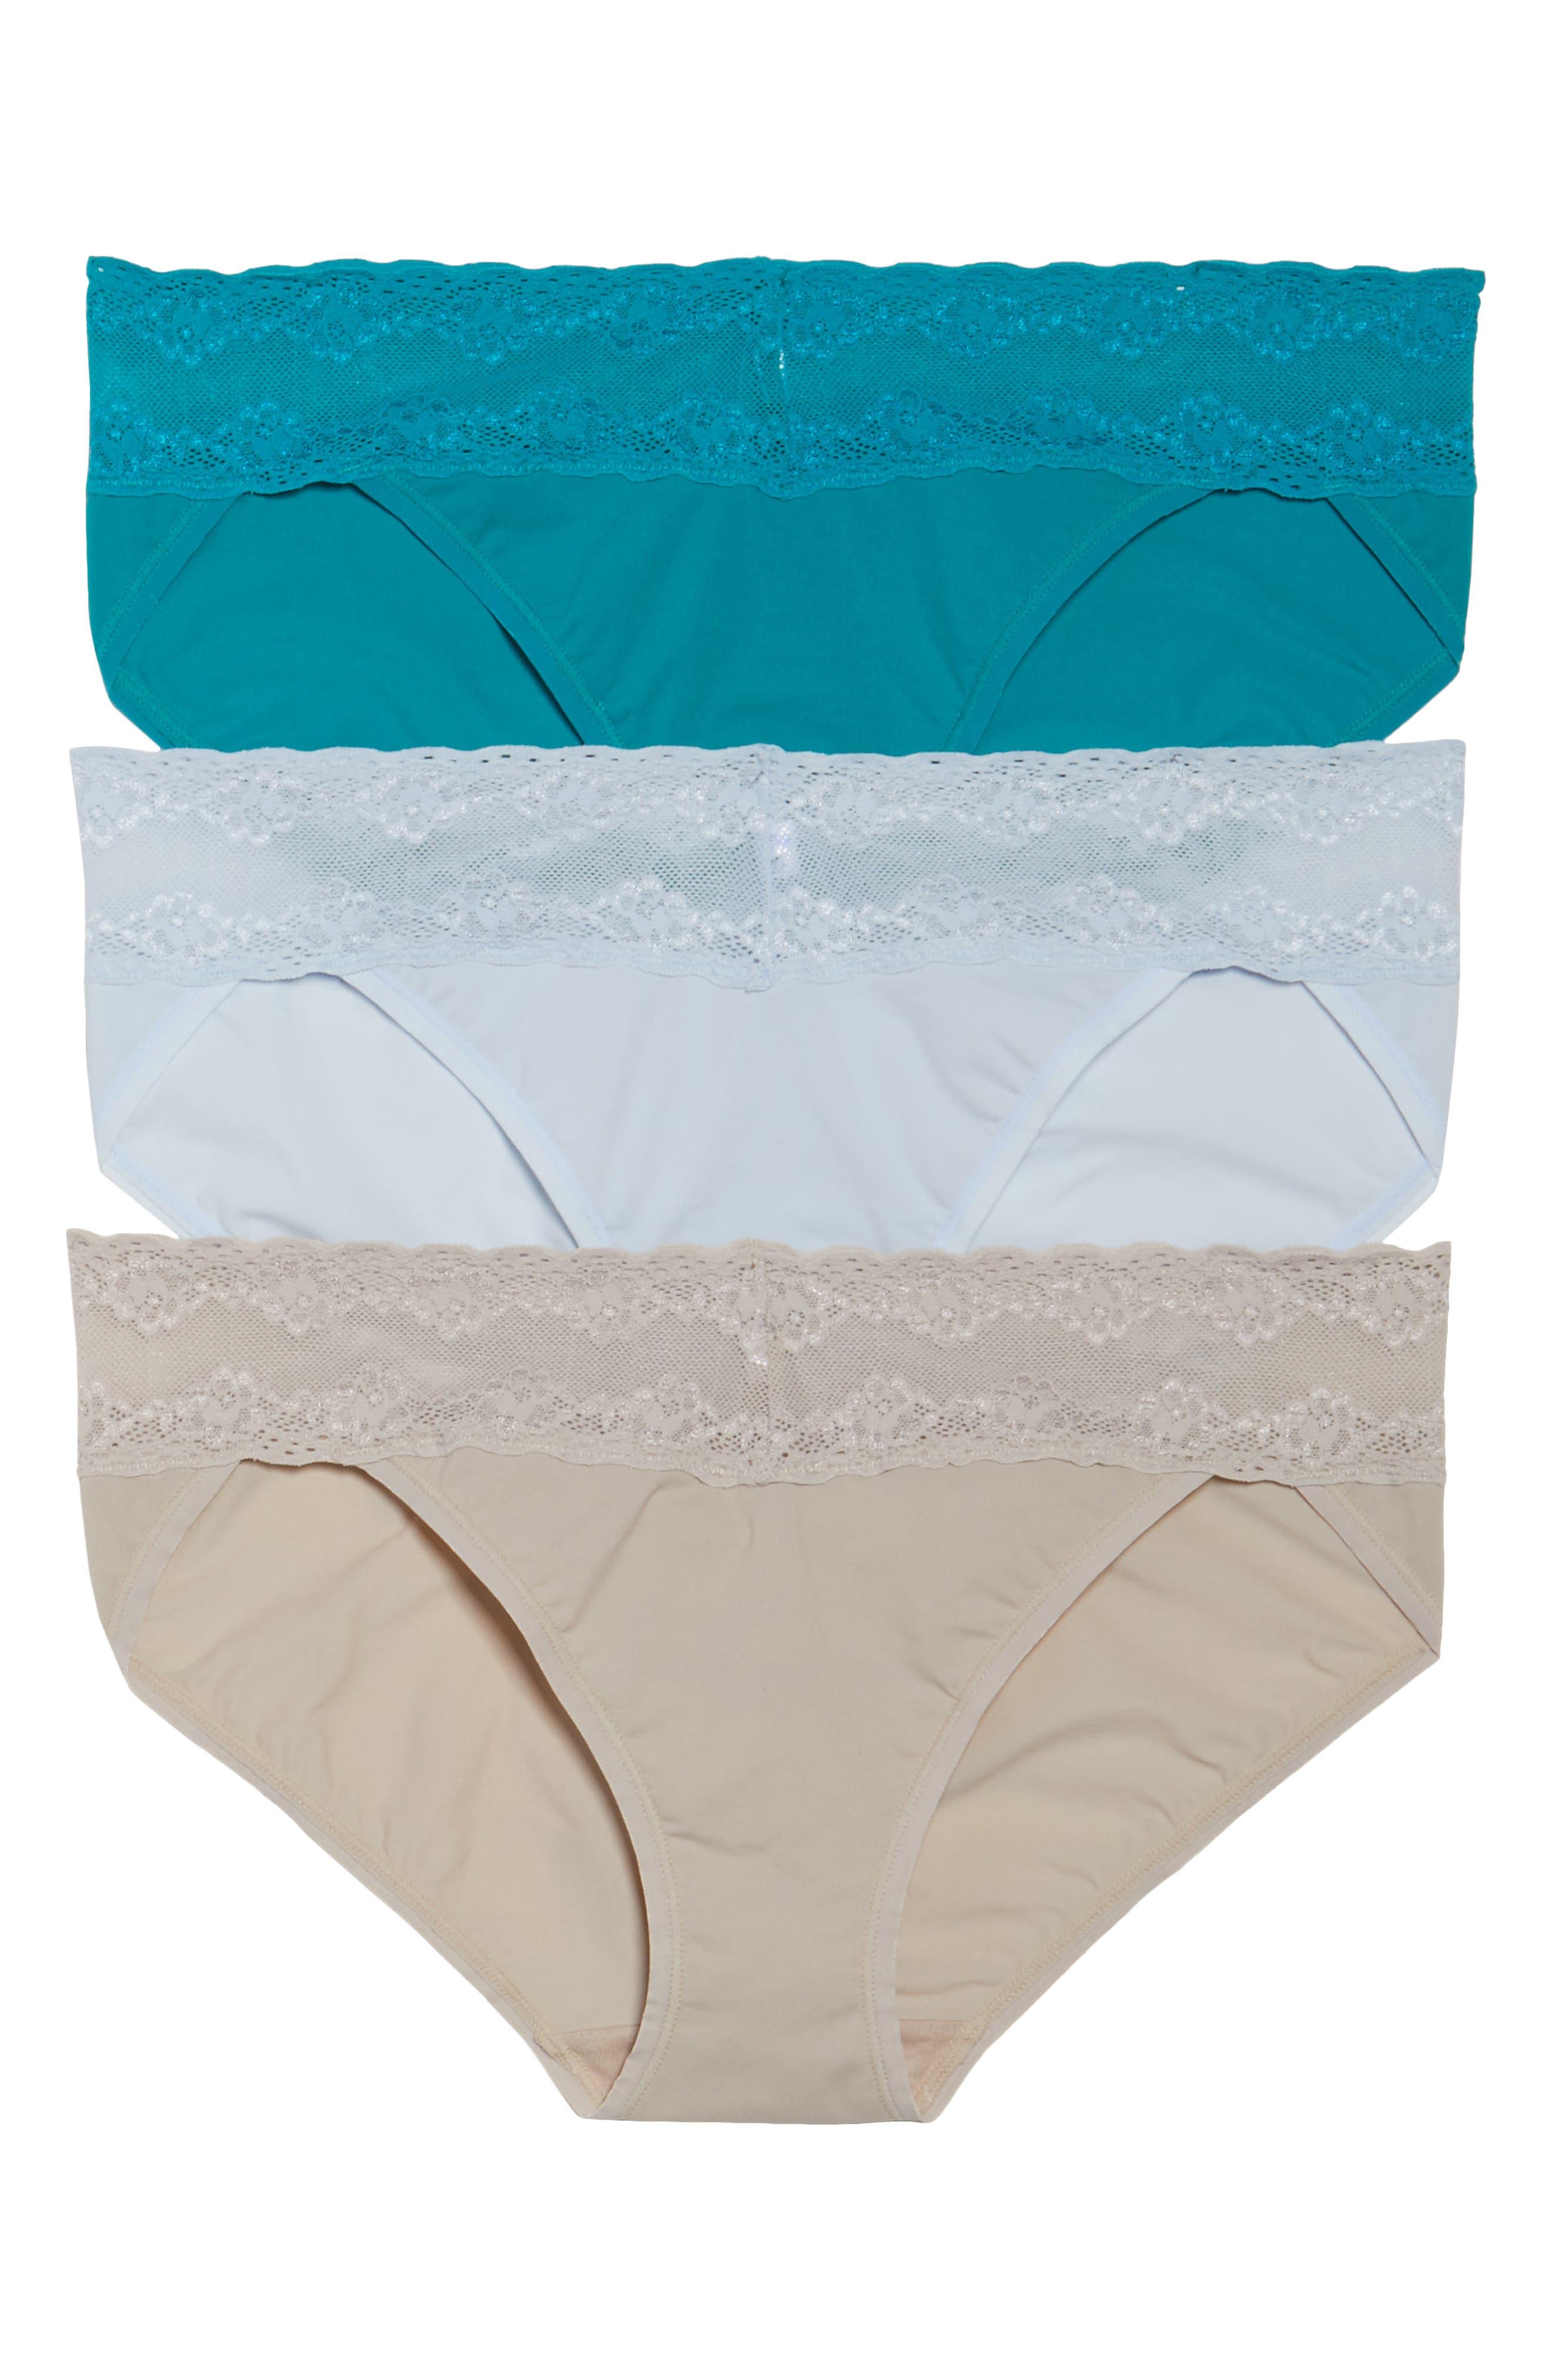 Alternate Image 1 Selected - Natori 'Bliss Perfection' Bikini Briefs (3-Pack)